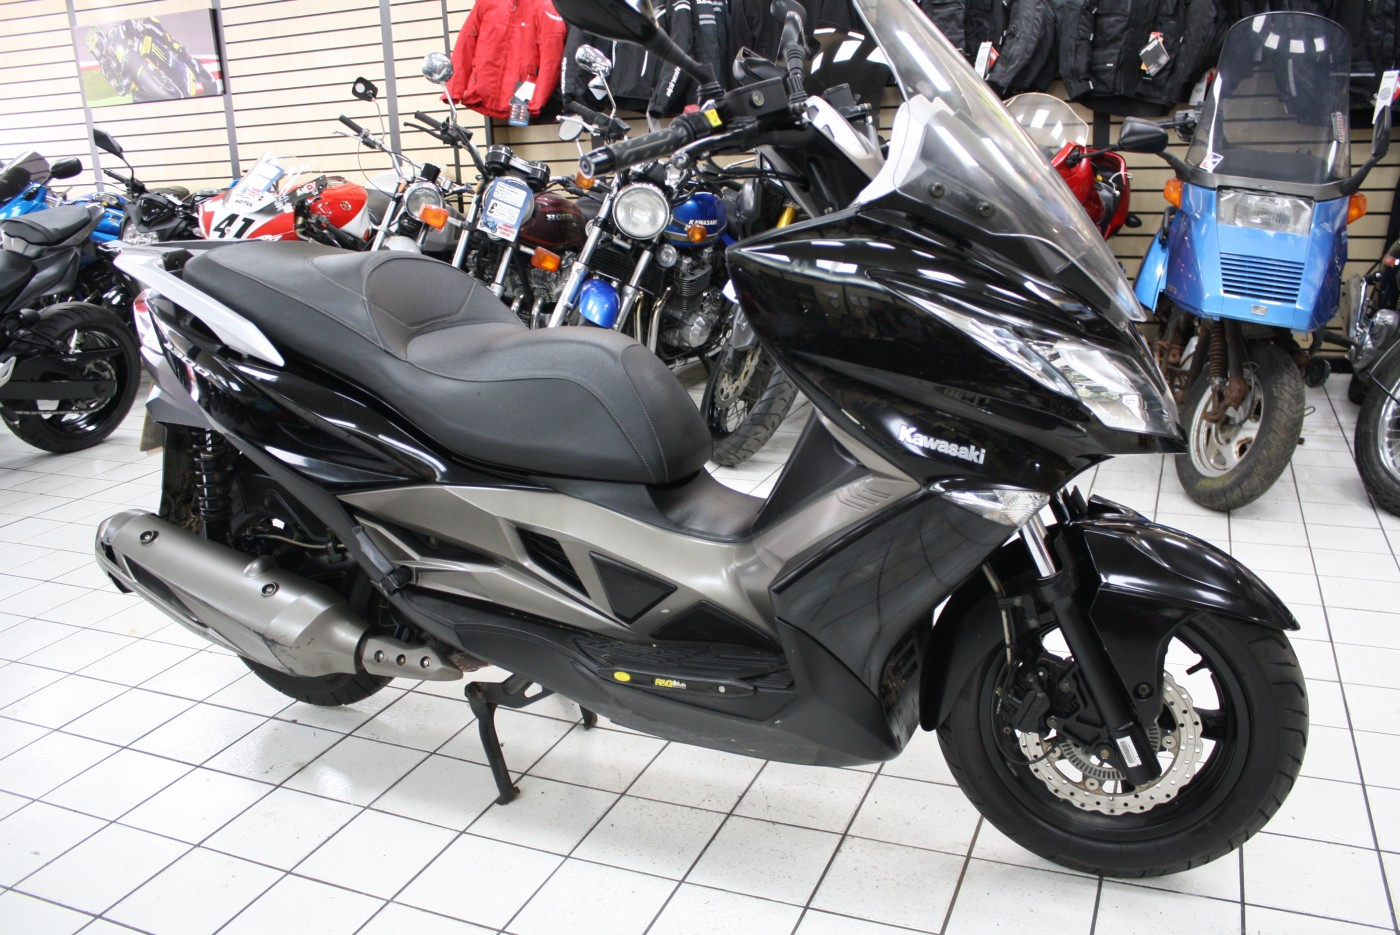 2015 Kawasaki J300 SC300 Black 8k